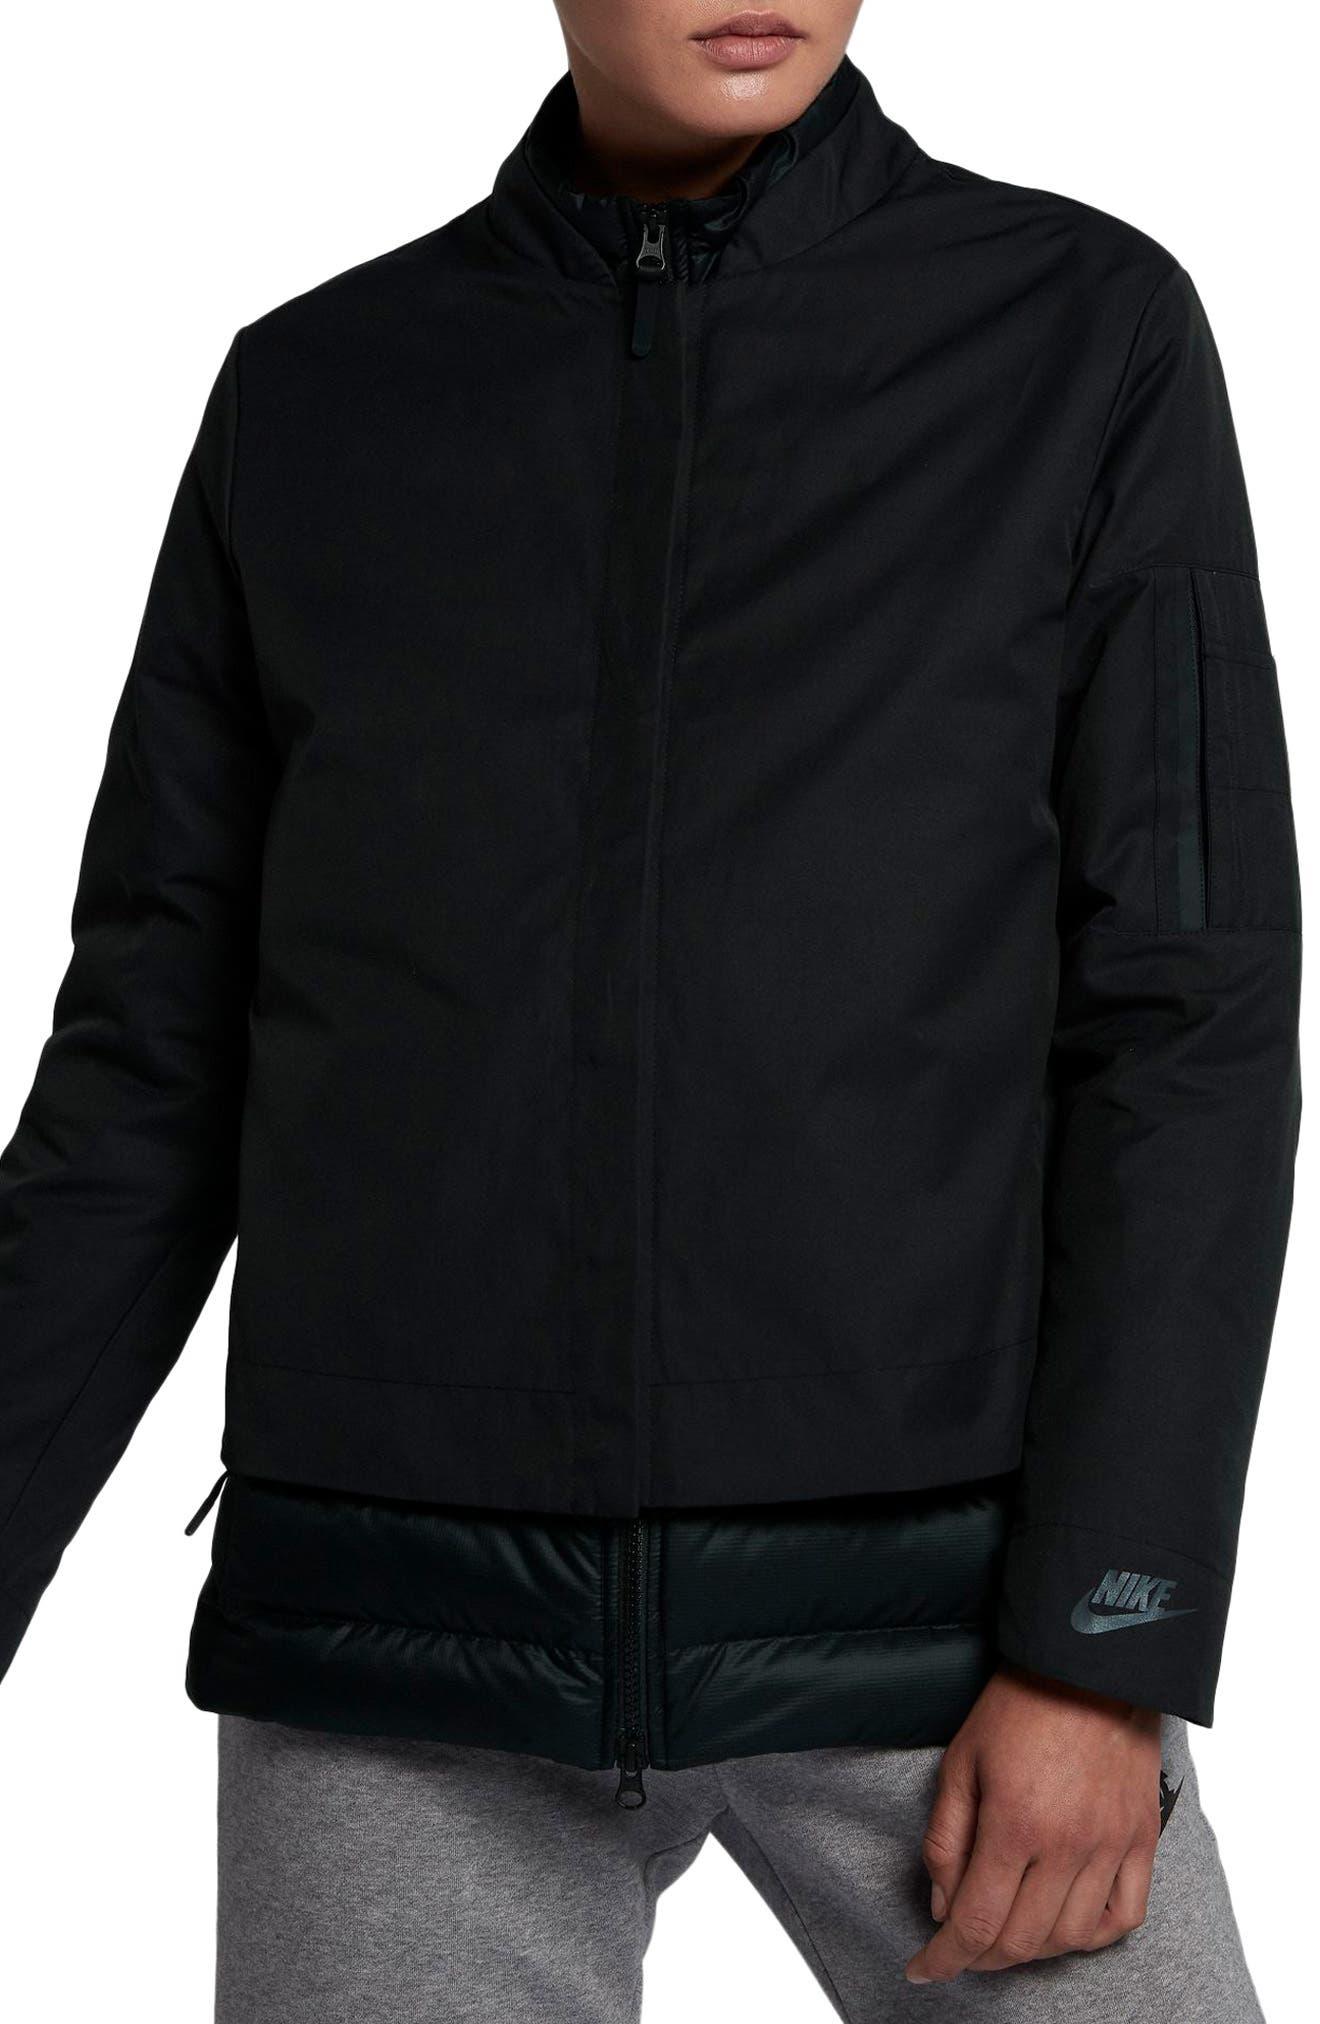 Sportswear AeroLoft 3-in-1 Down Jacket,                         Main,                         color, Black/ Black/ Black